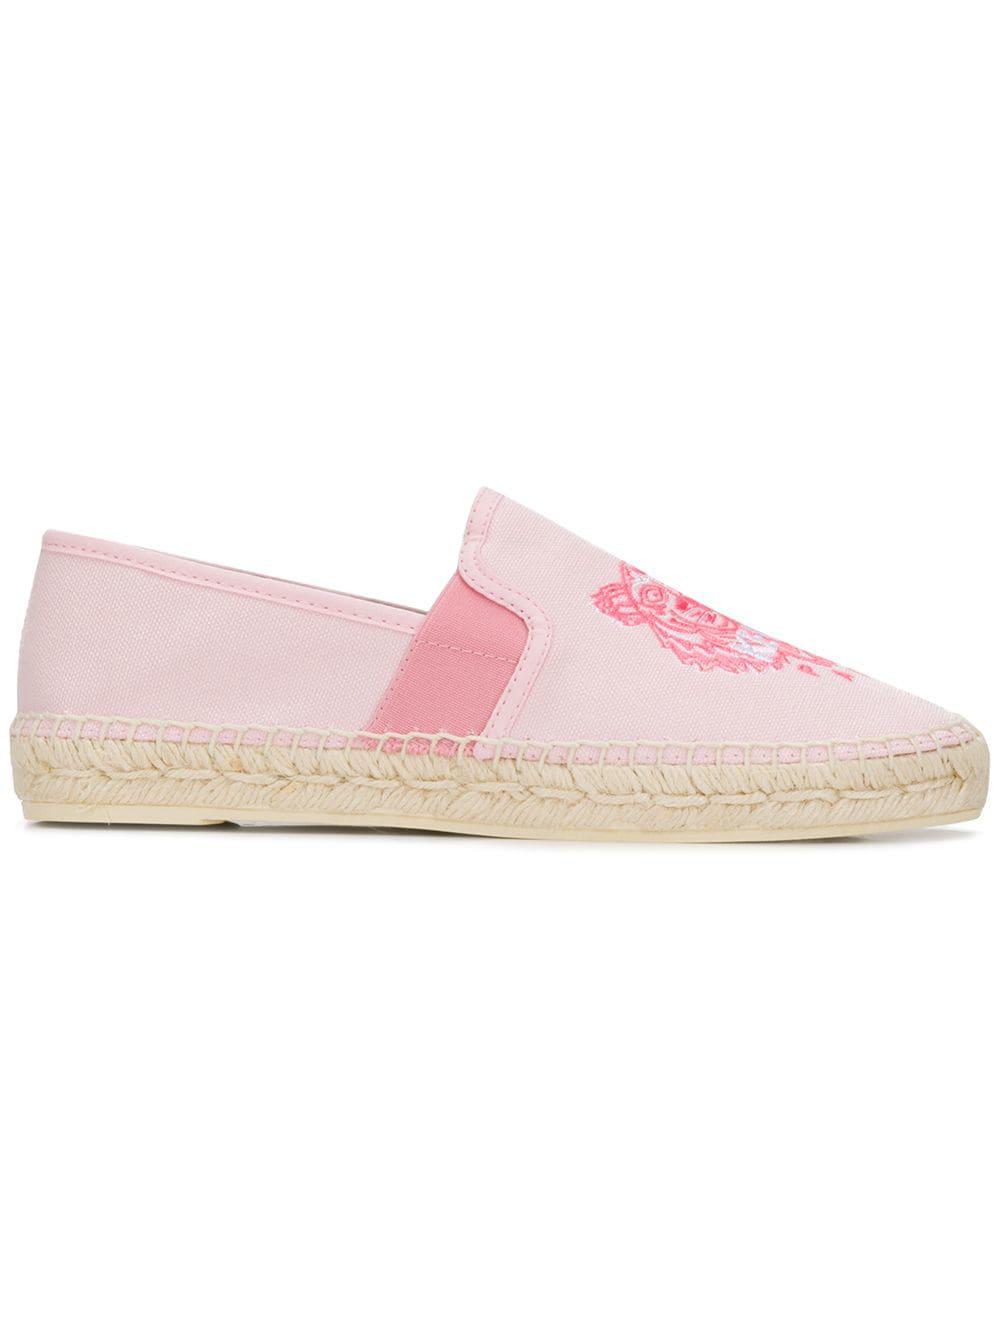 caae22856ec Kenzo Women's Classic Espadrille Flats In Pink | ModeSens